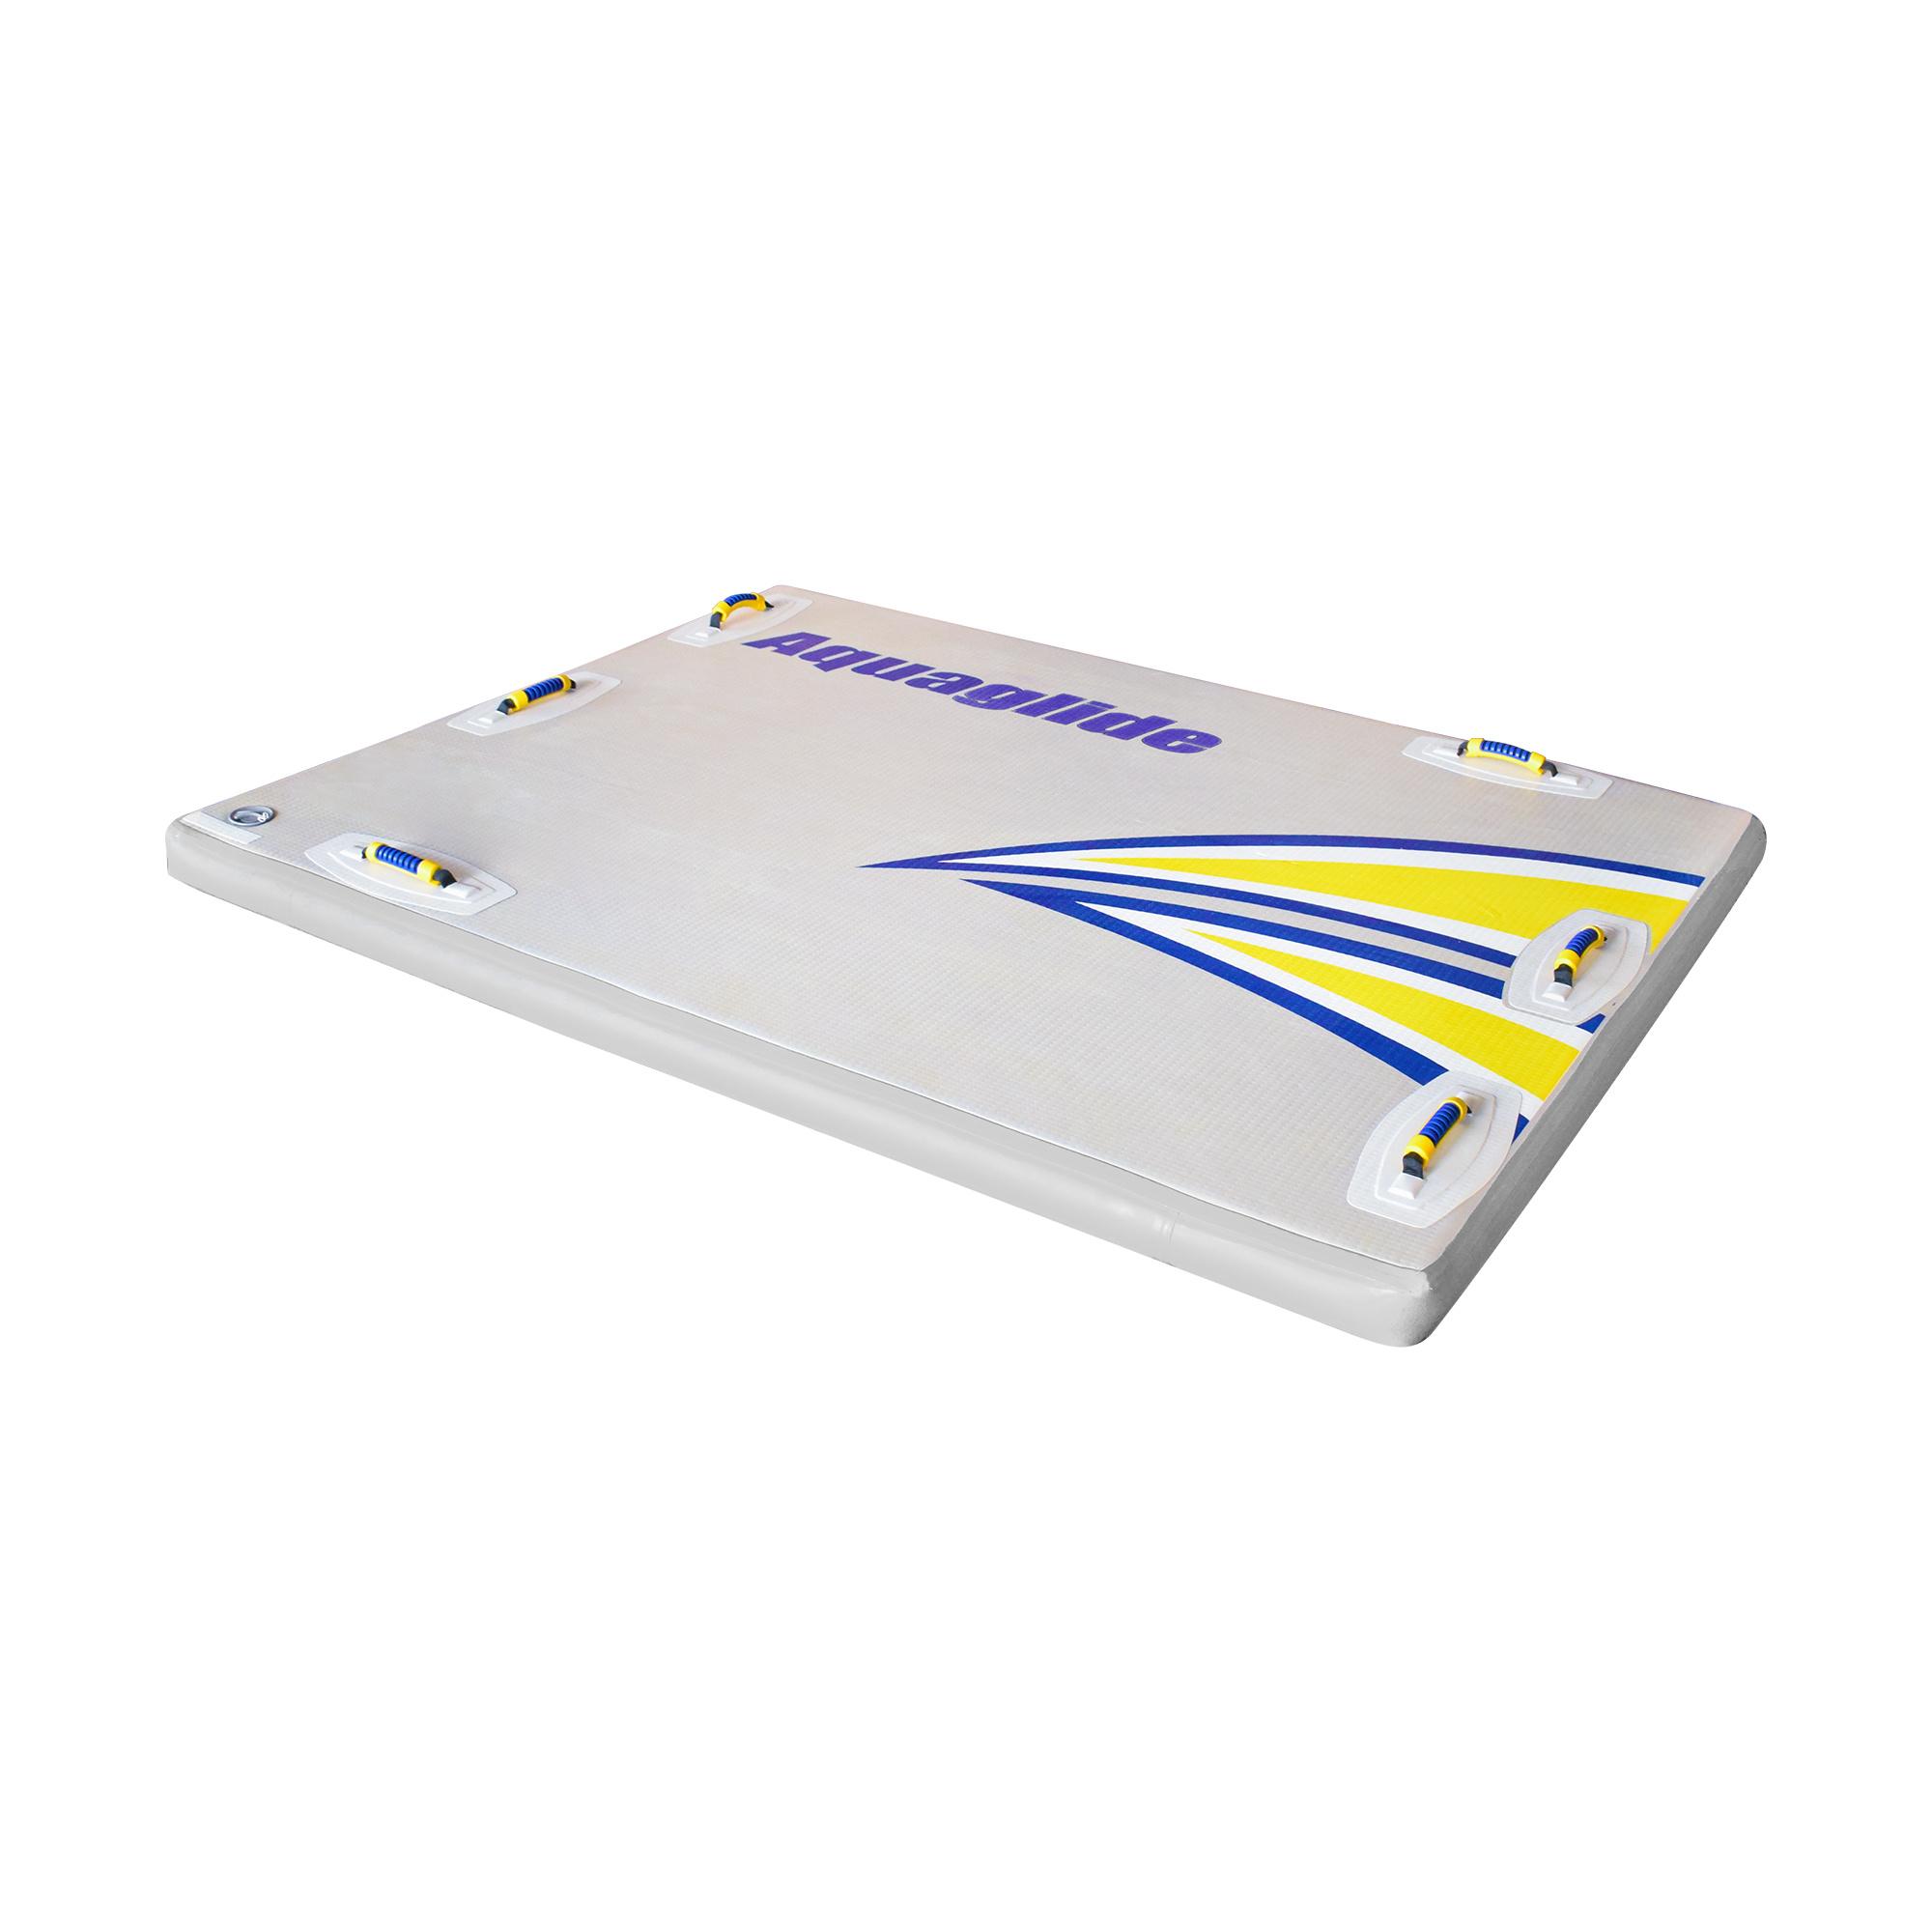 Swimstep XL - HD - Platform